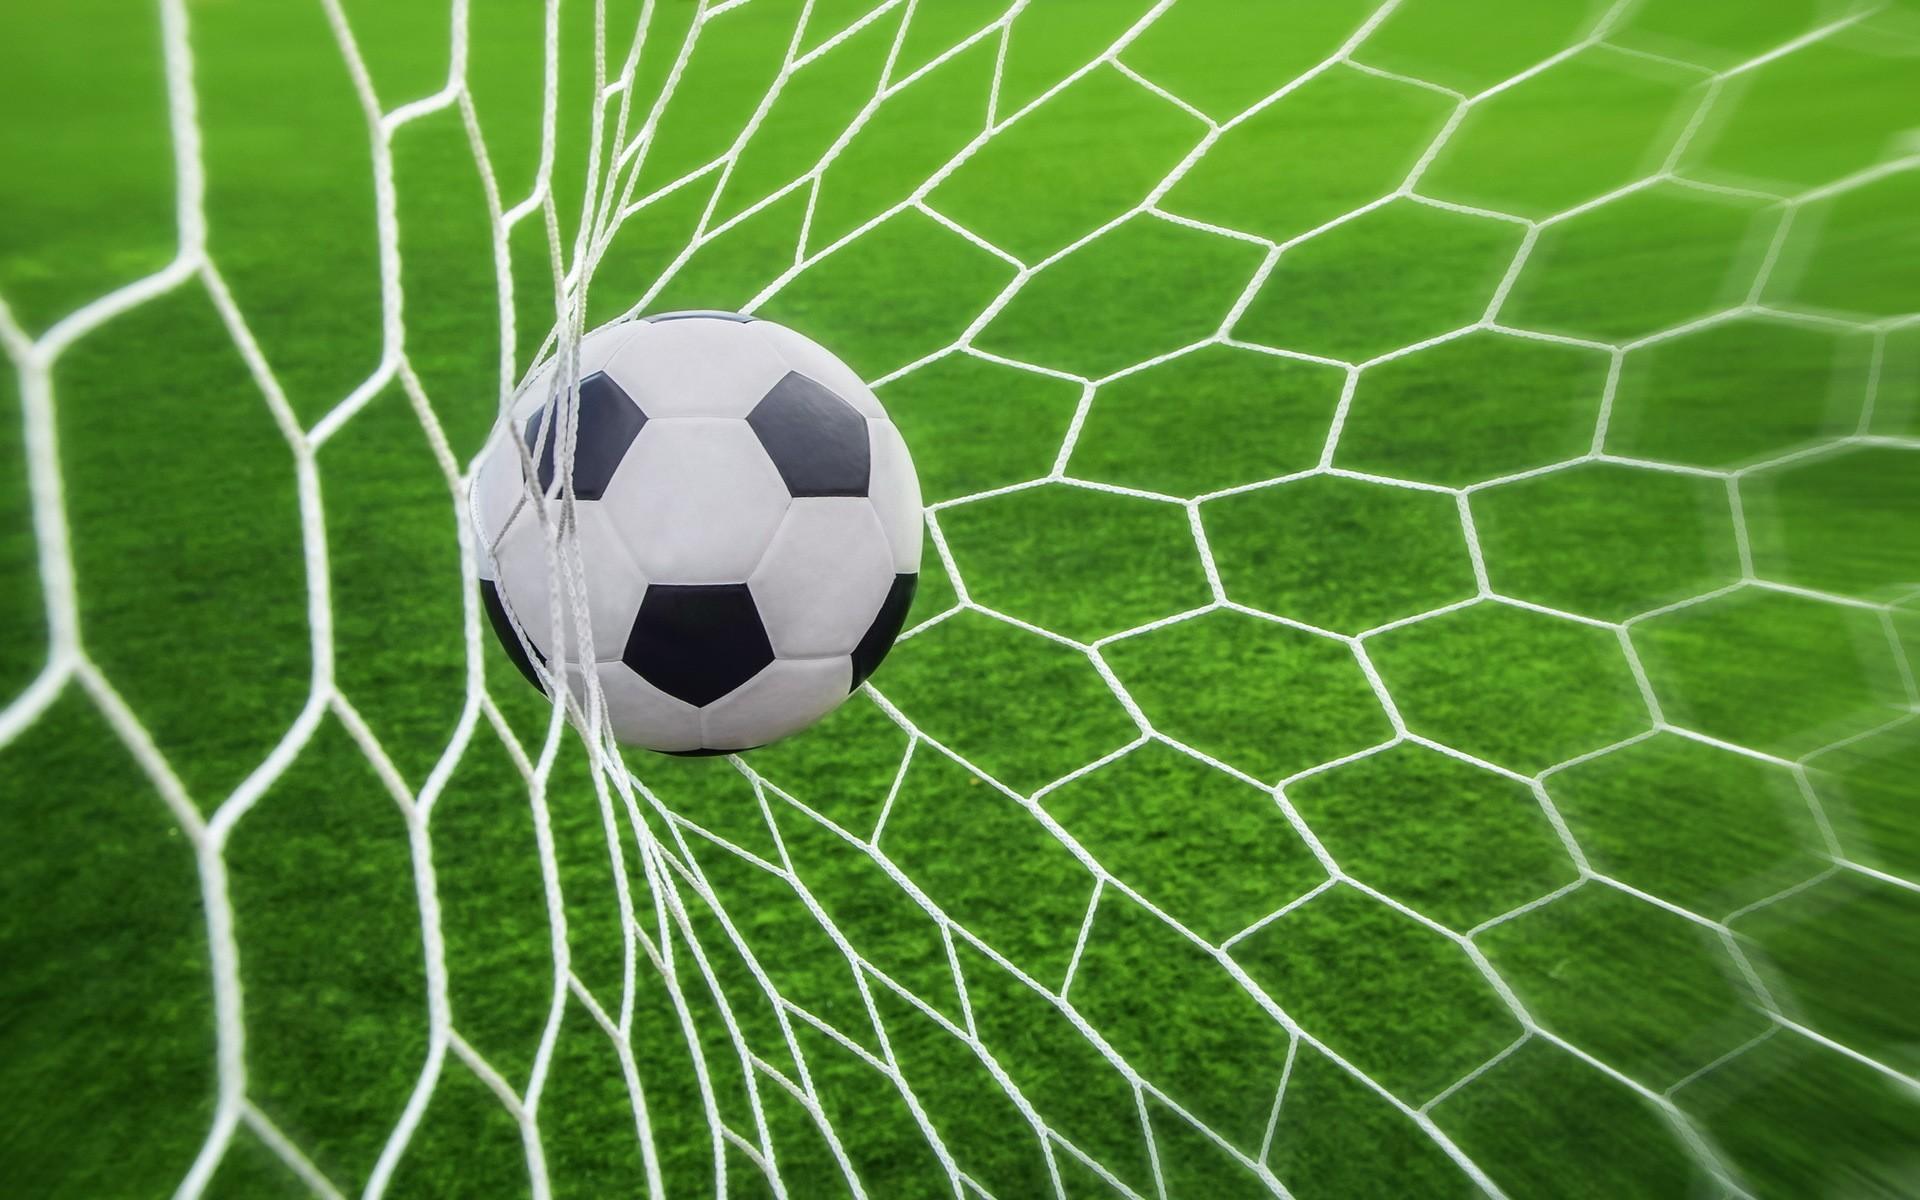 Fondos De Pantalla Fútbol Pelota Silueta Deporte: Fondos De Pantalla : Deportes, Profundidad De Campo